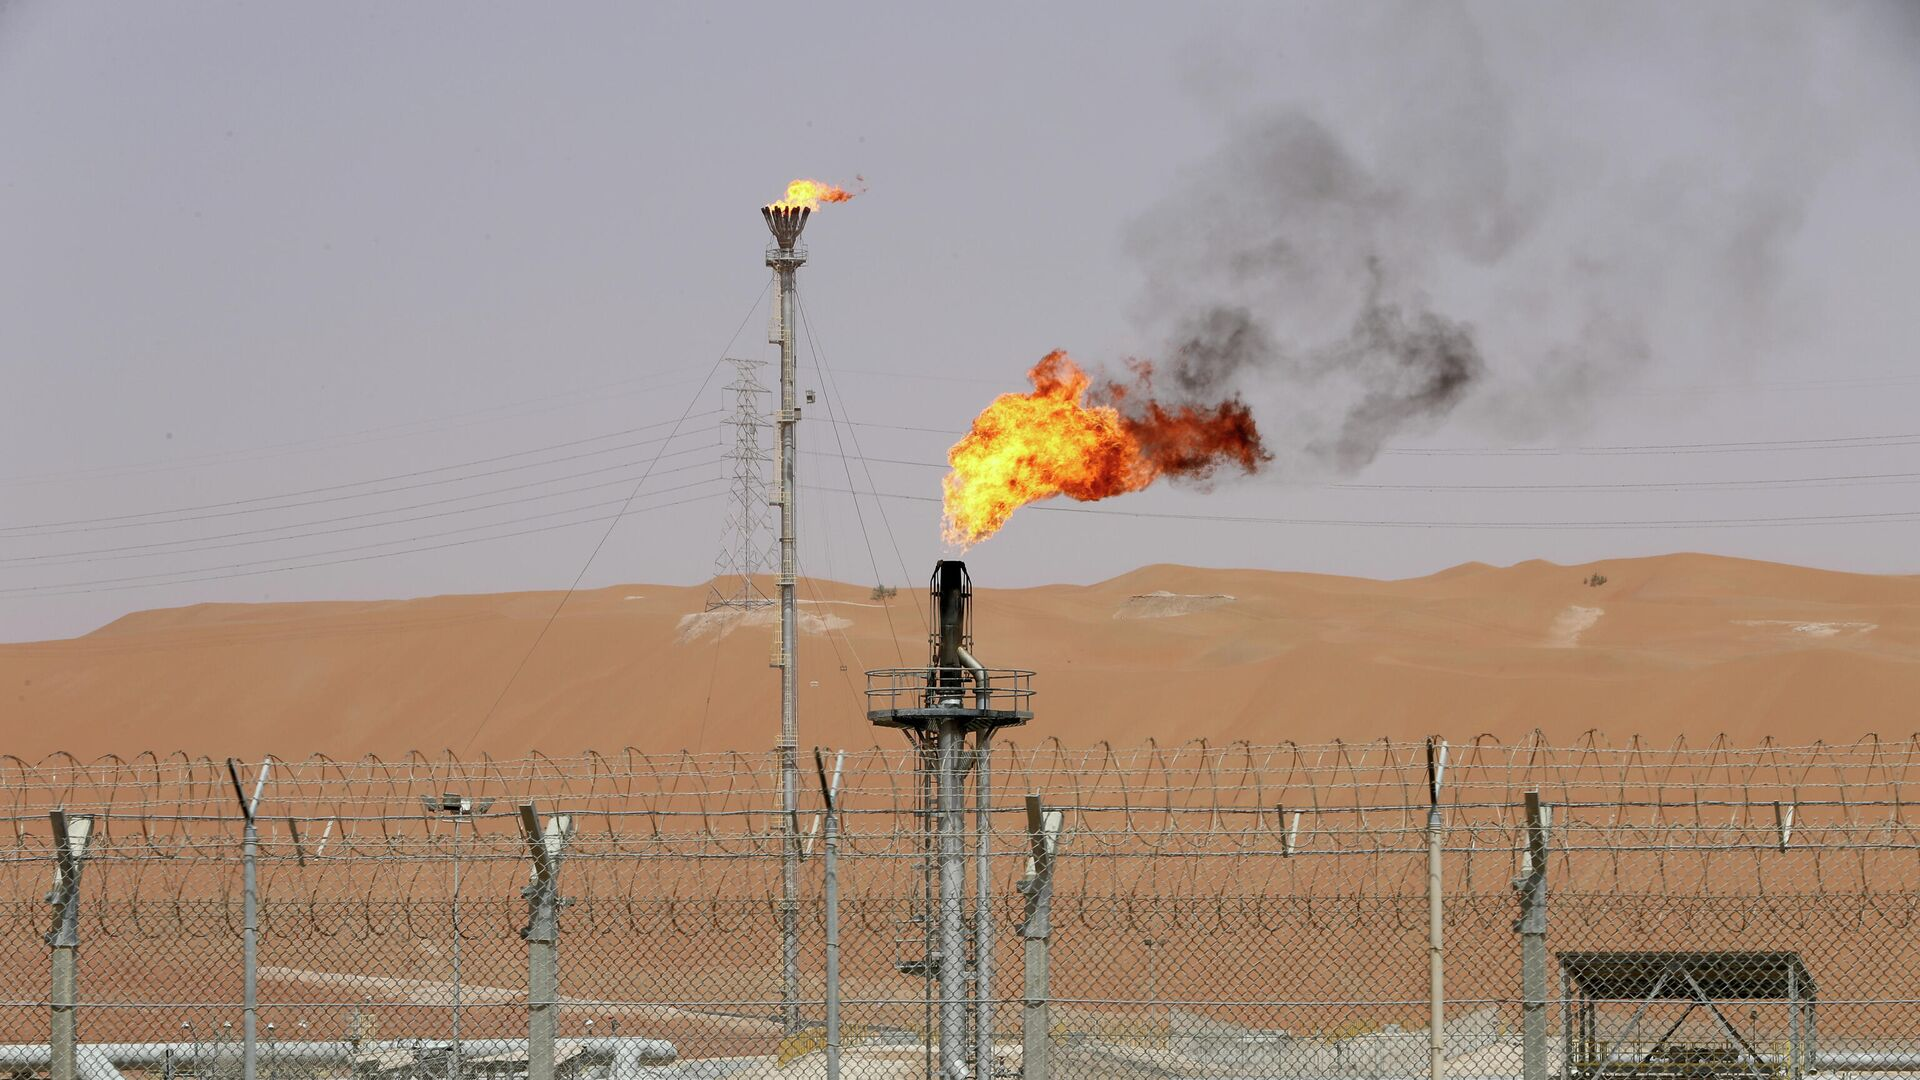 Refinerías de petróleo de Arabia Saudí Saudi Aramco - Sputnik Mundo, 1920, 14.04.2021